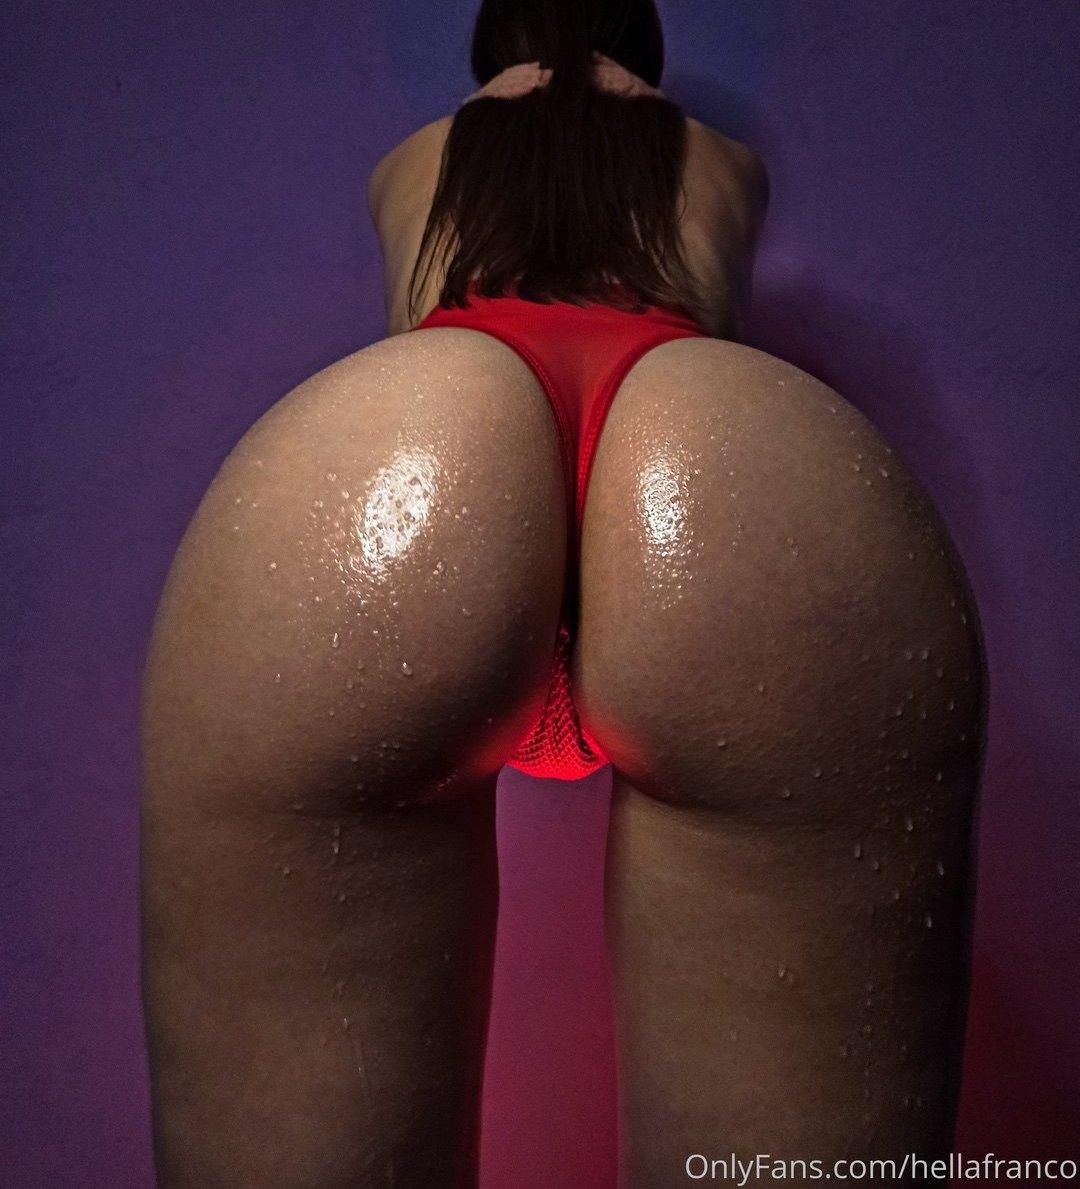 Hellafranco Onlyfans Nudes Leaks 0021